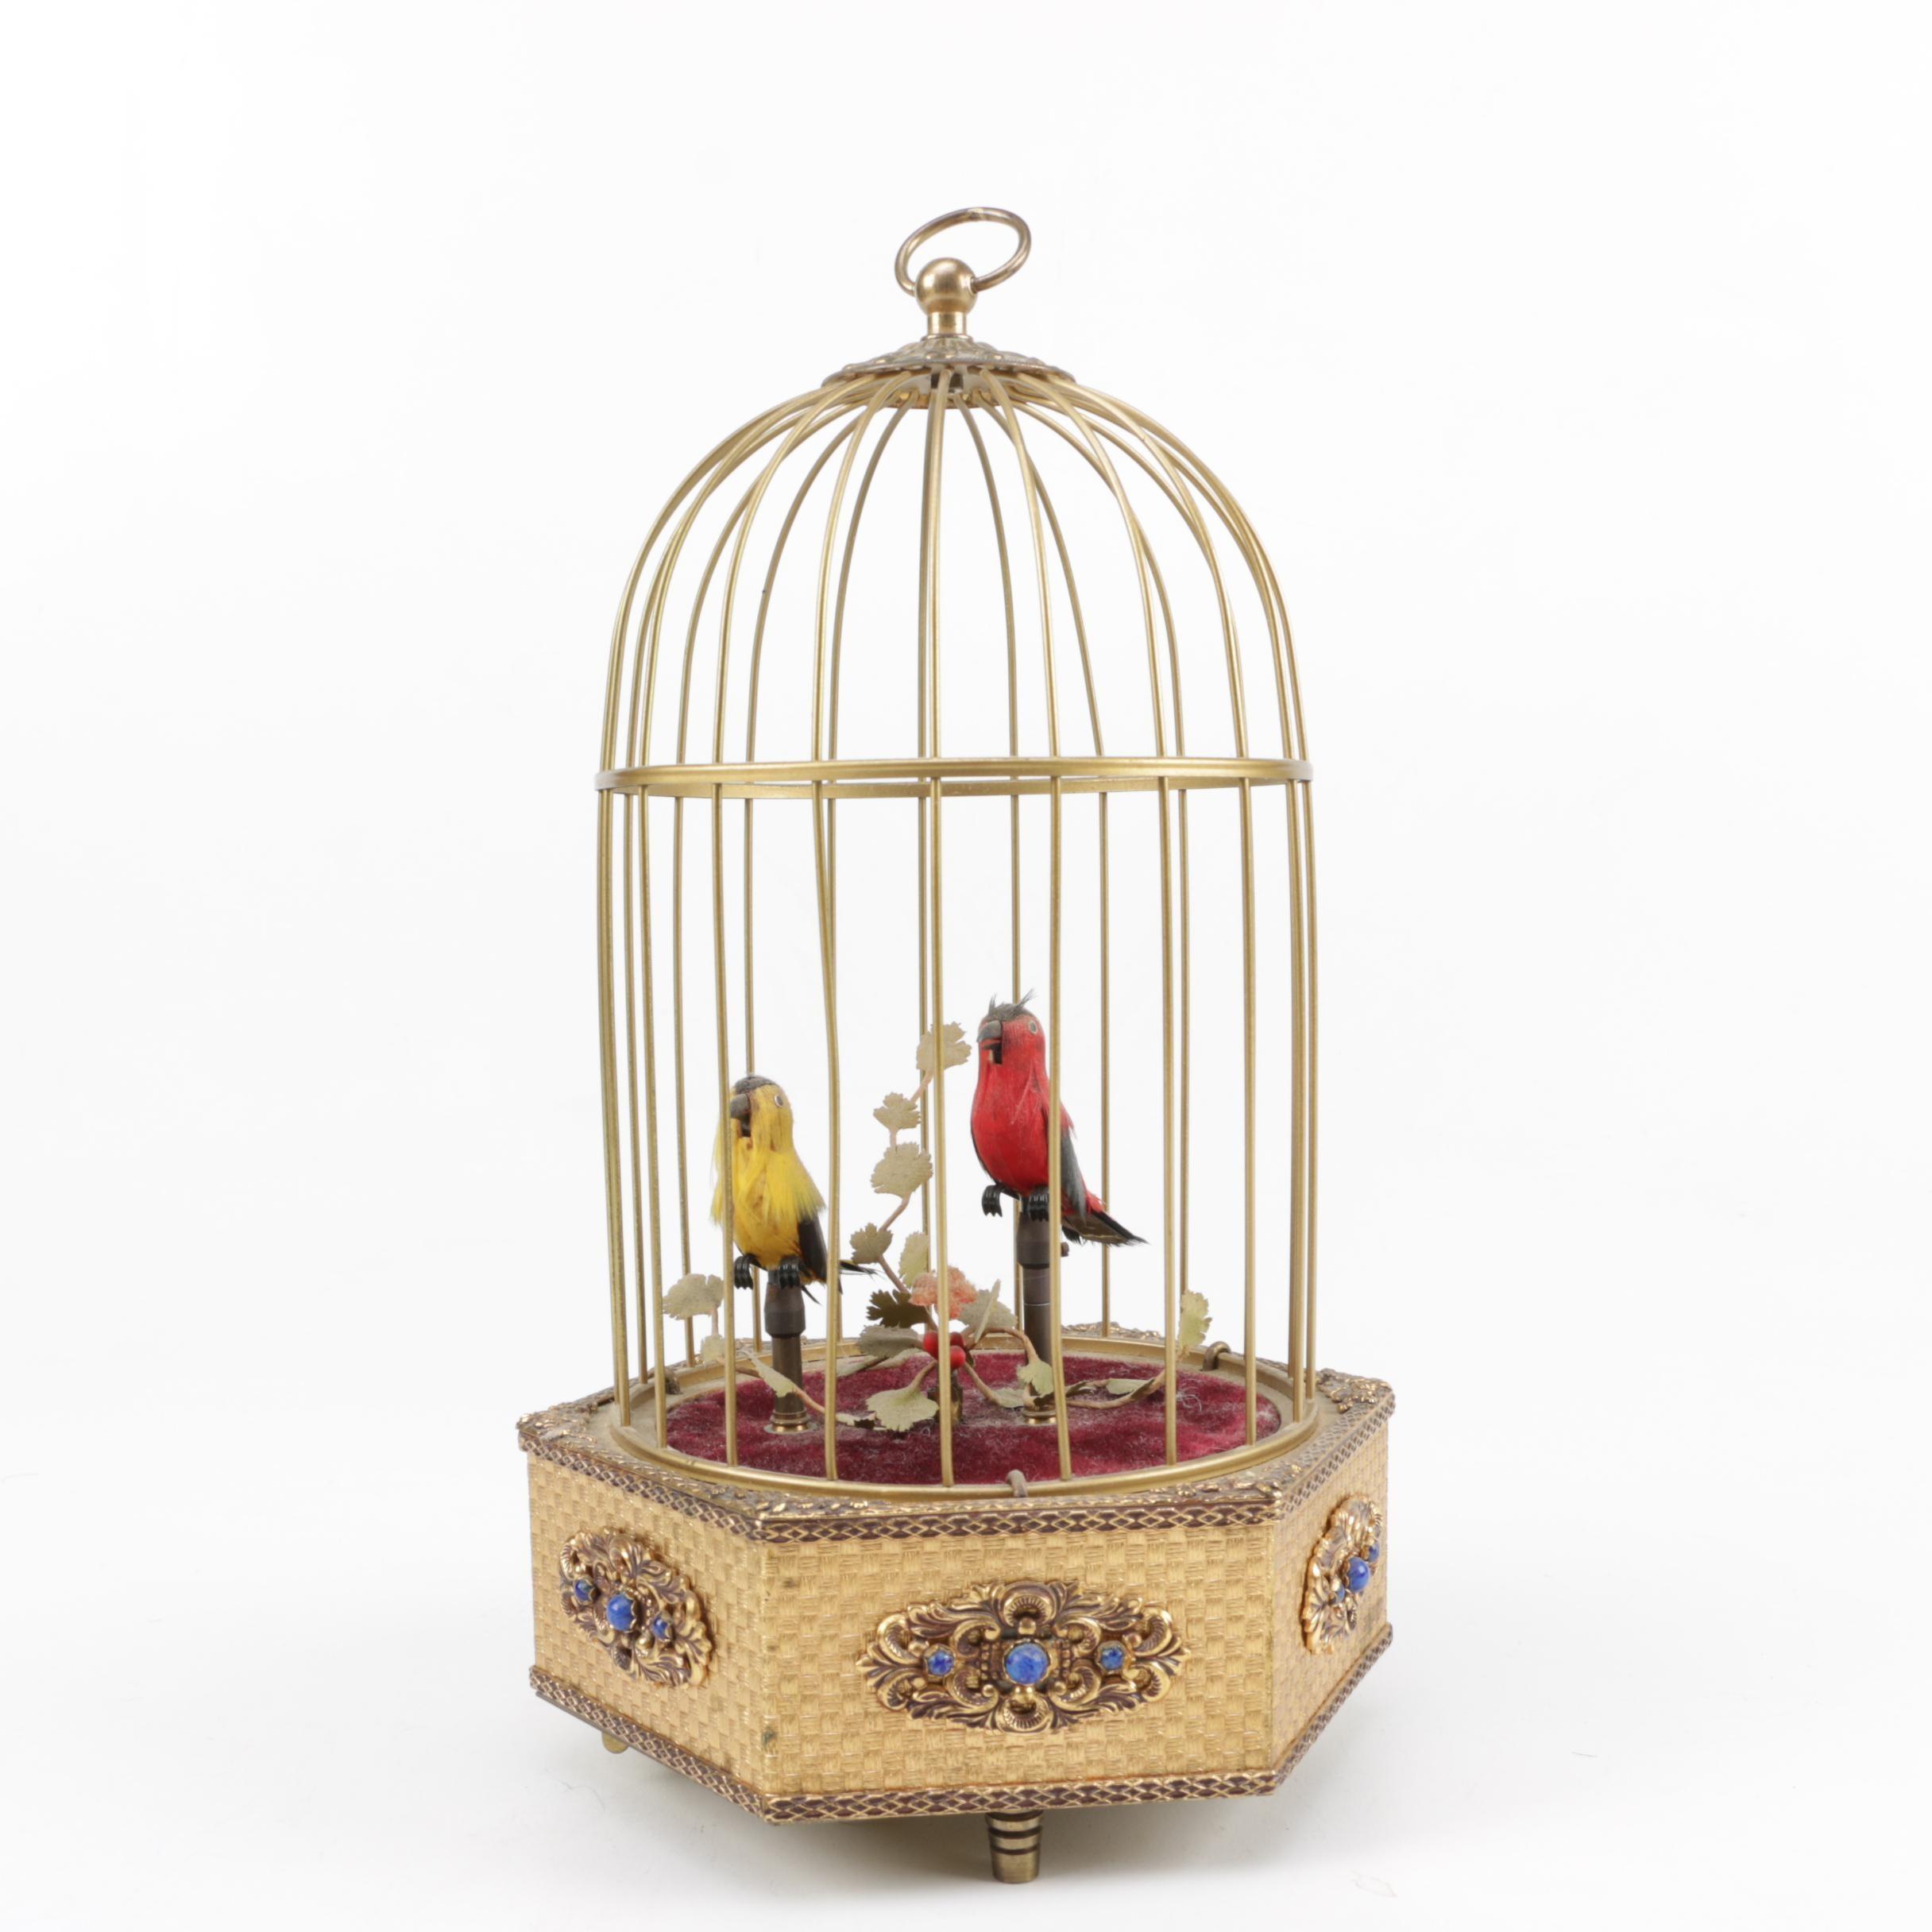 German Mechanical Birds in Cage